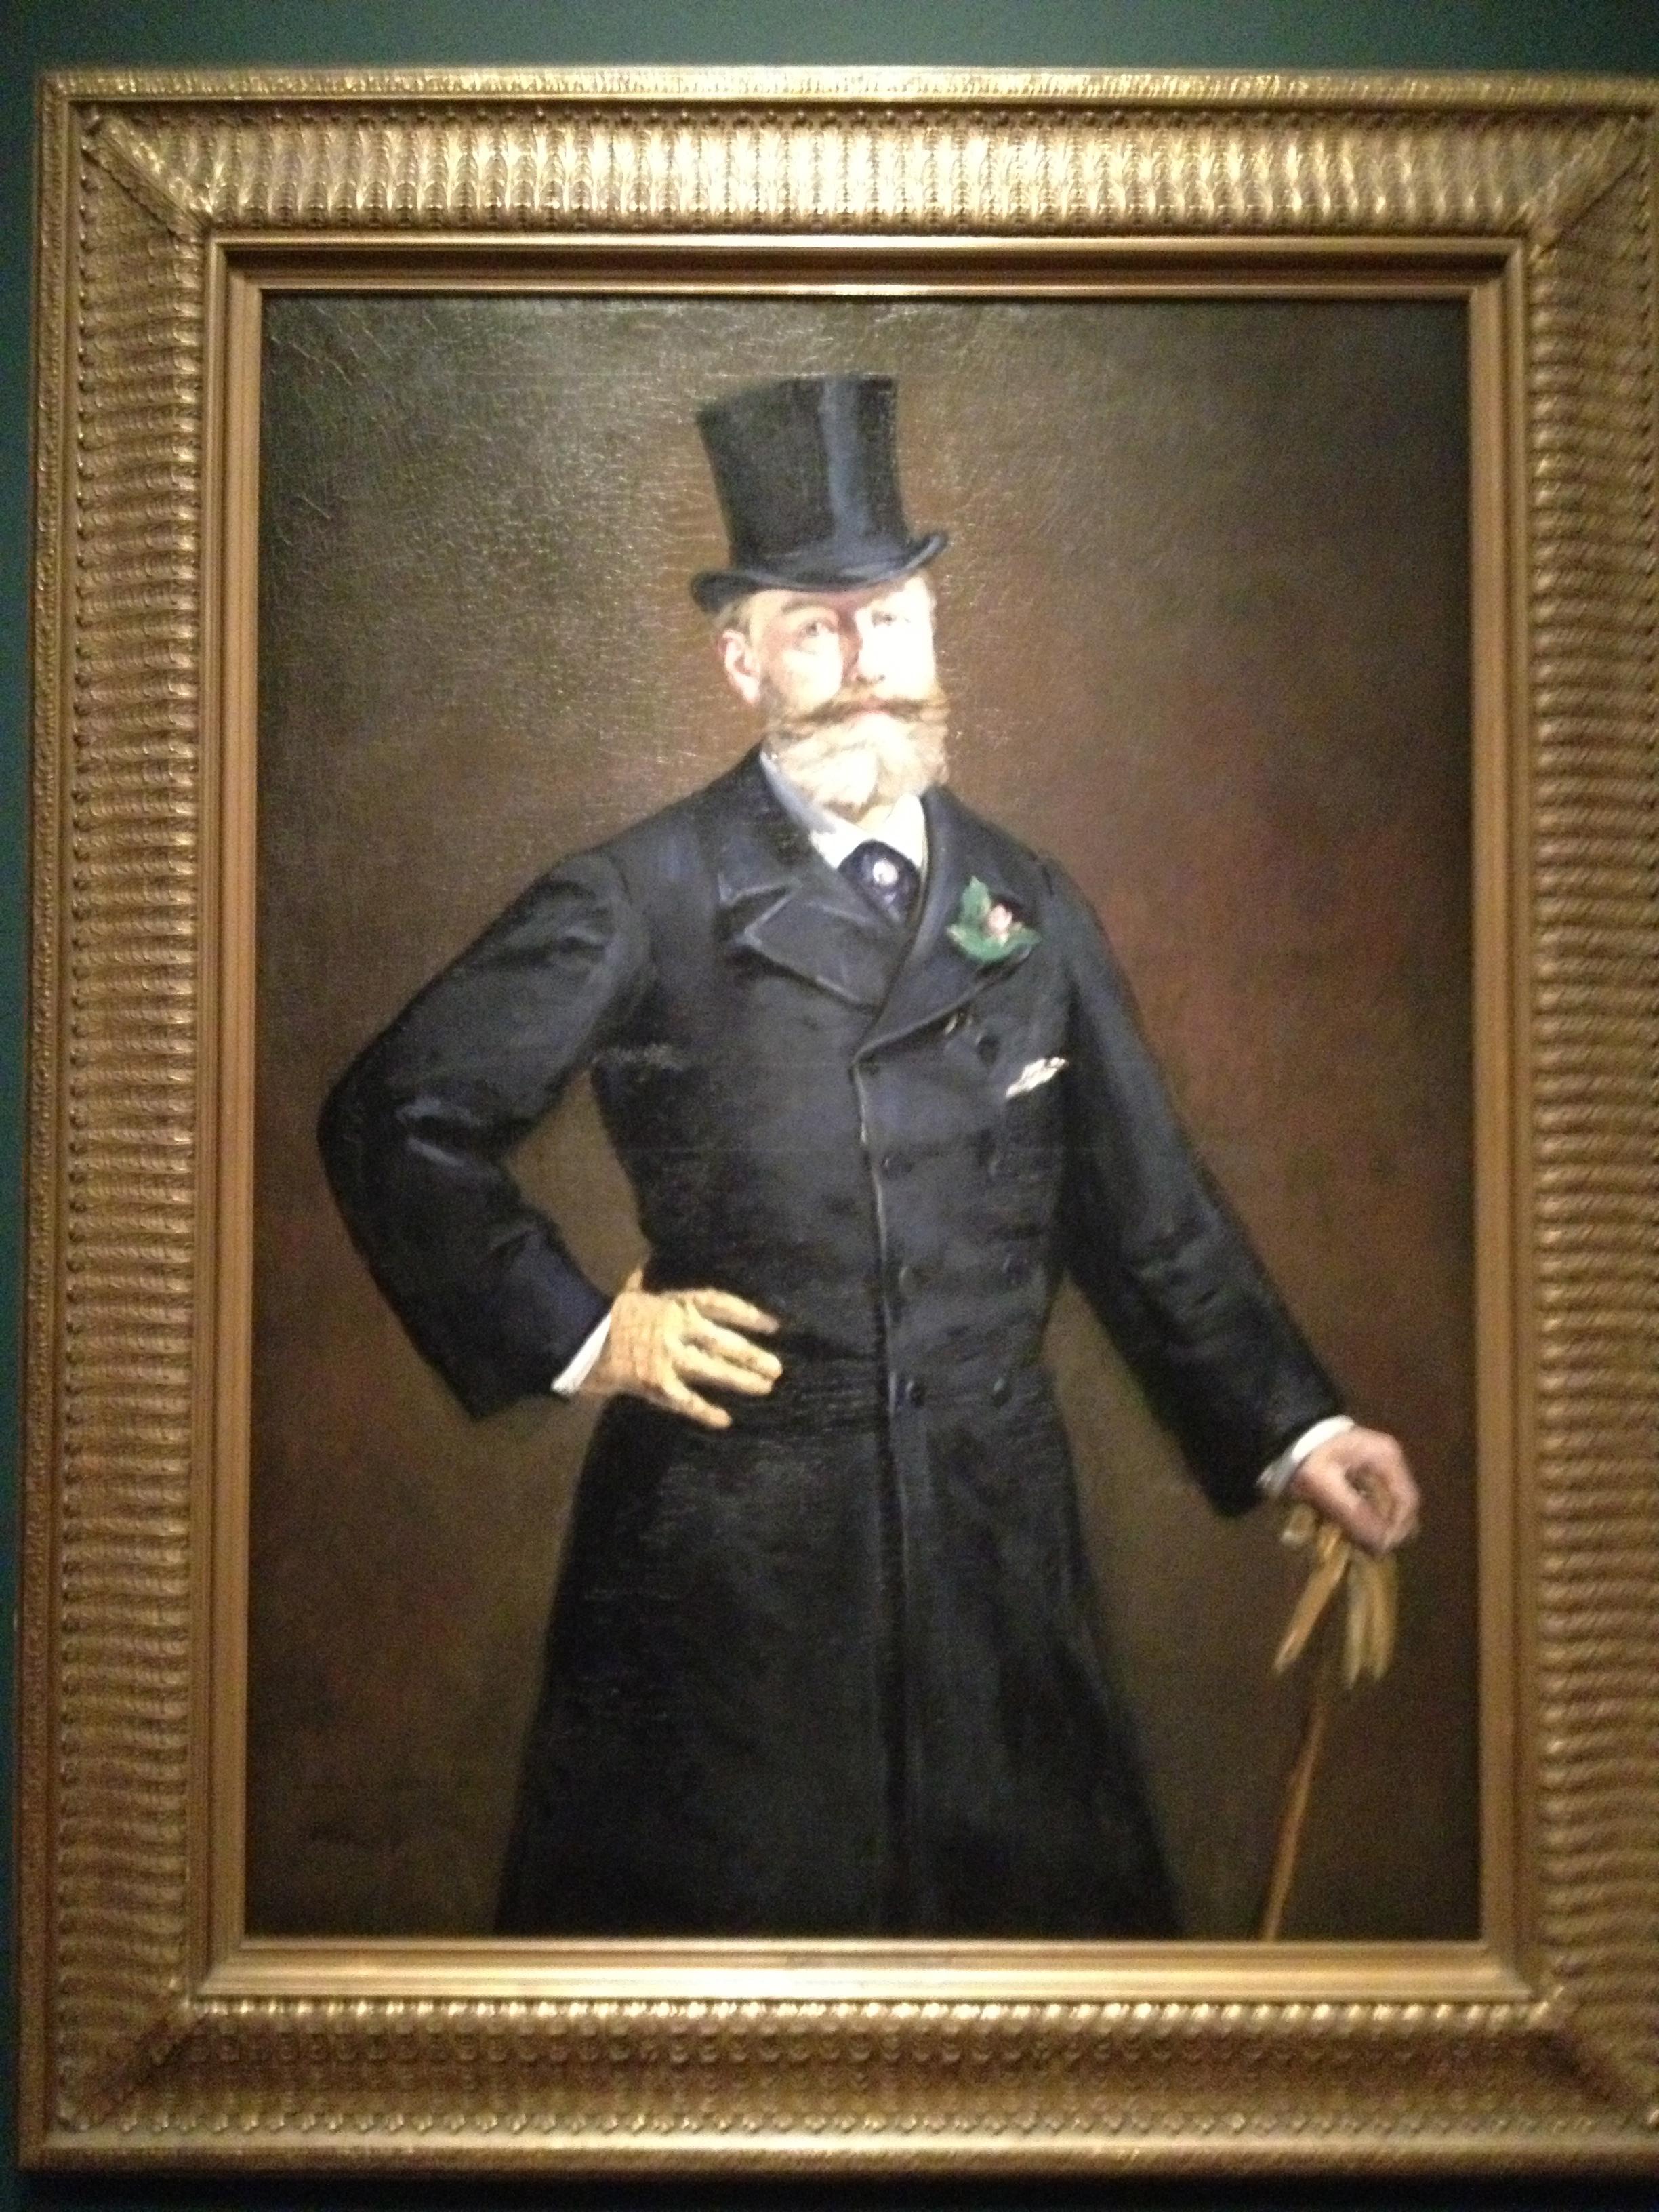 Portrait of M. Antonin Proust, 1880. Lent by the Toledo Museum of Art.